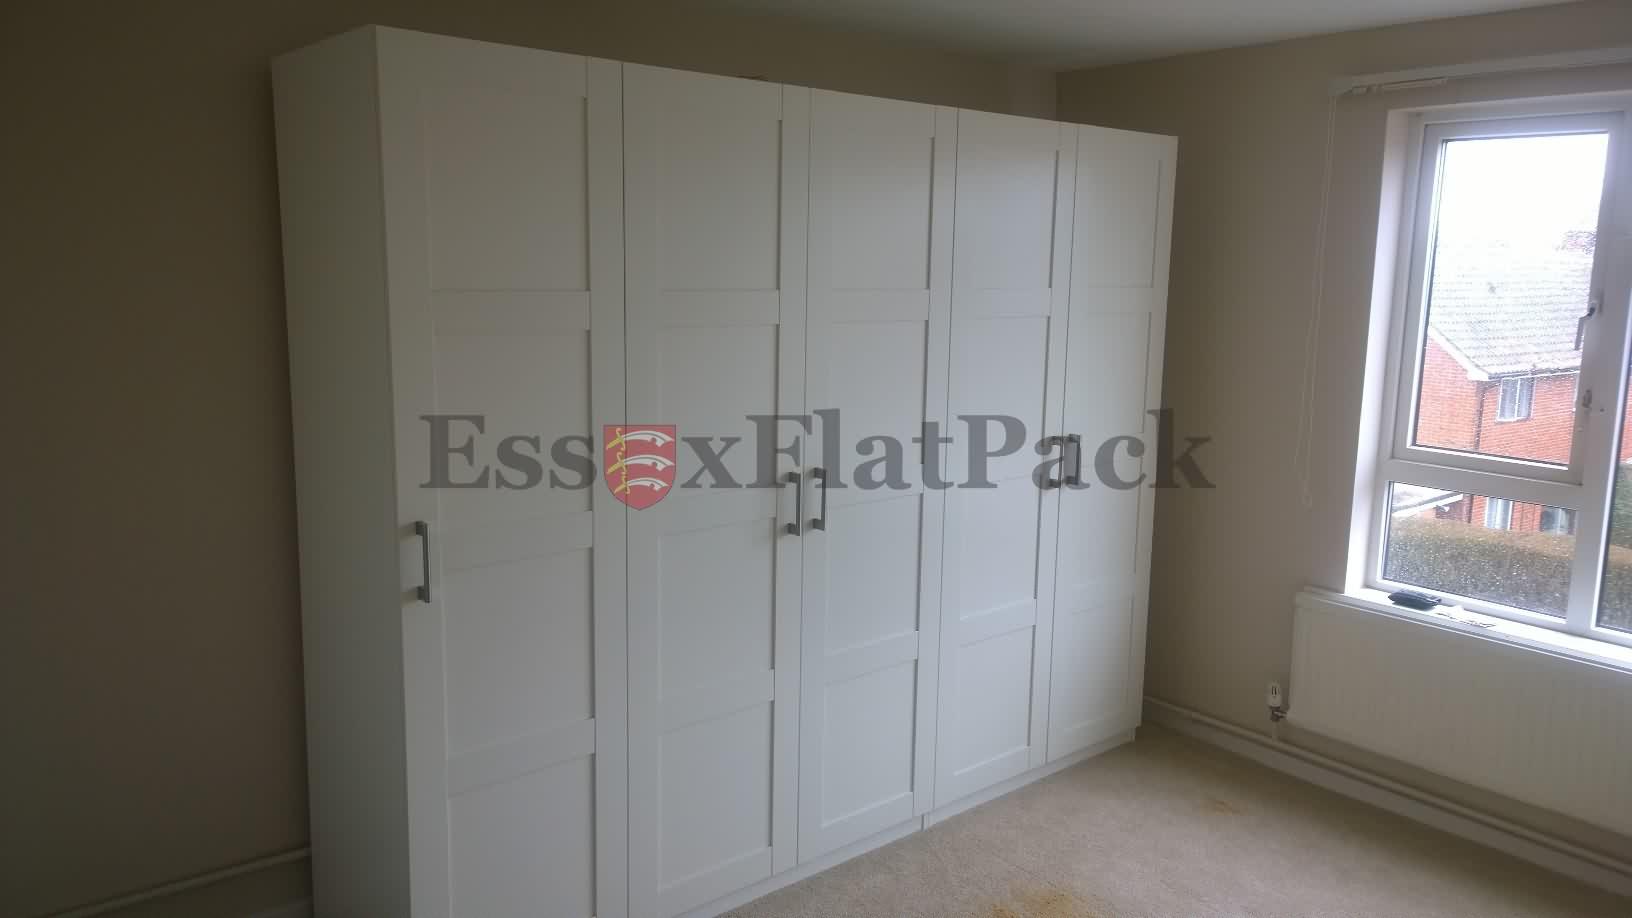 essexflatpack-furniture-20150226130646.jpg